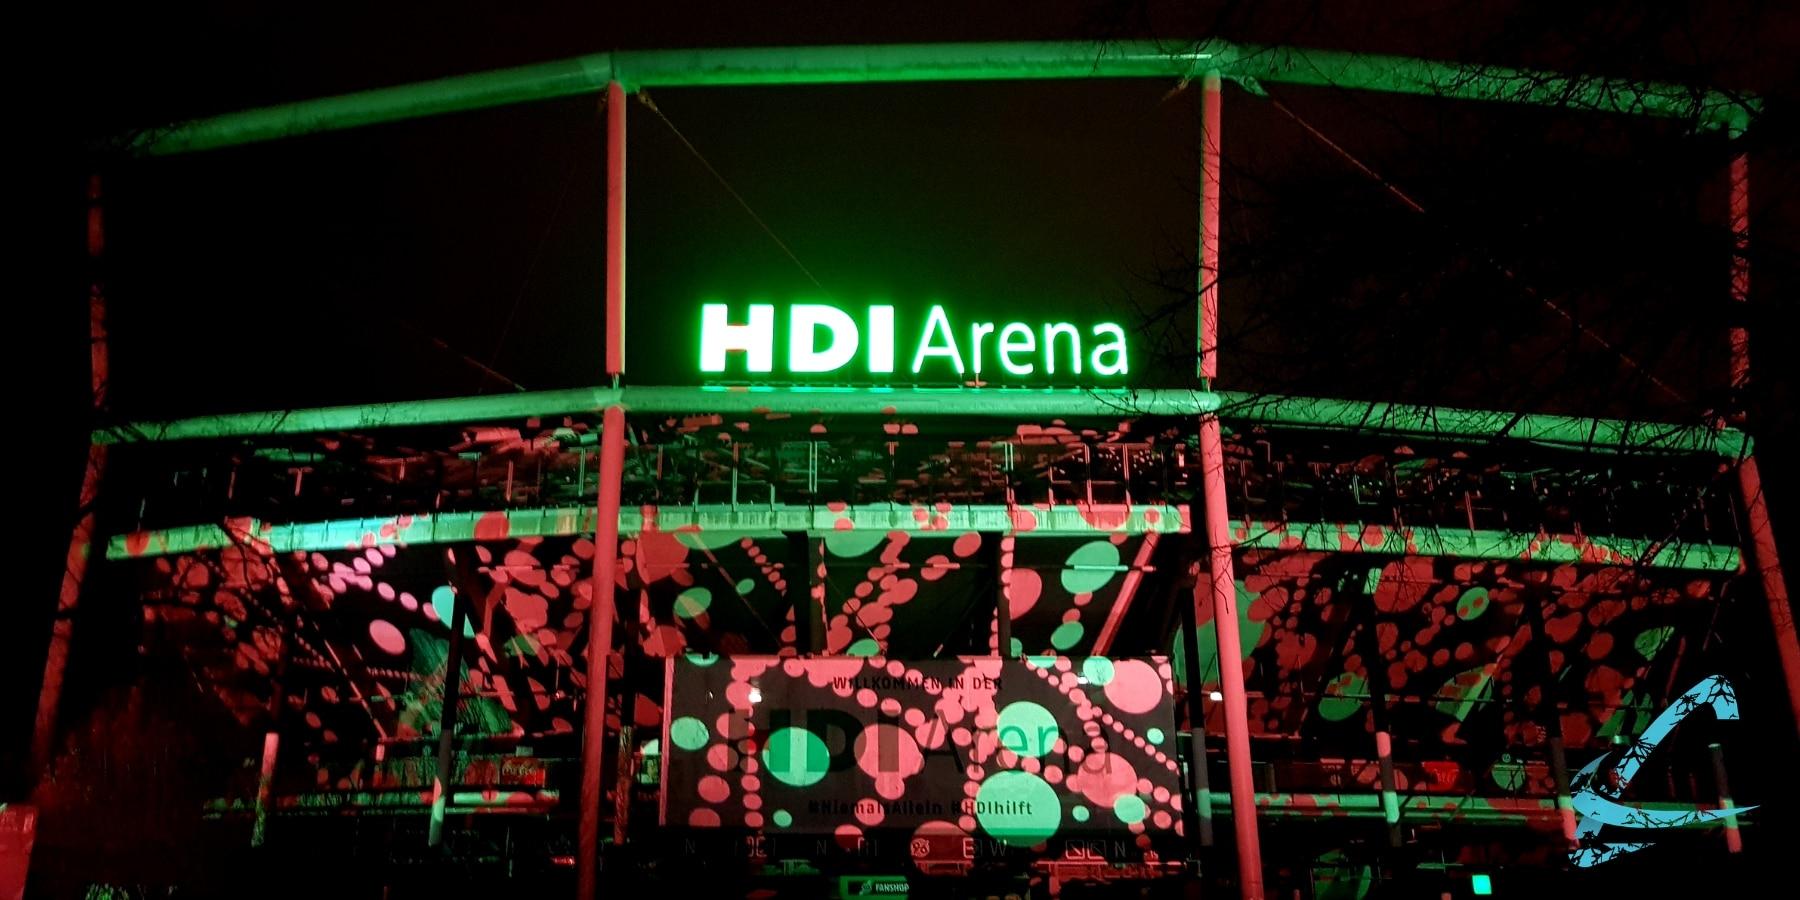 Projektion HDI Arena